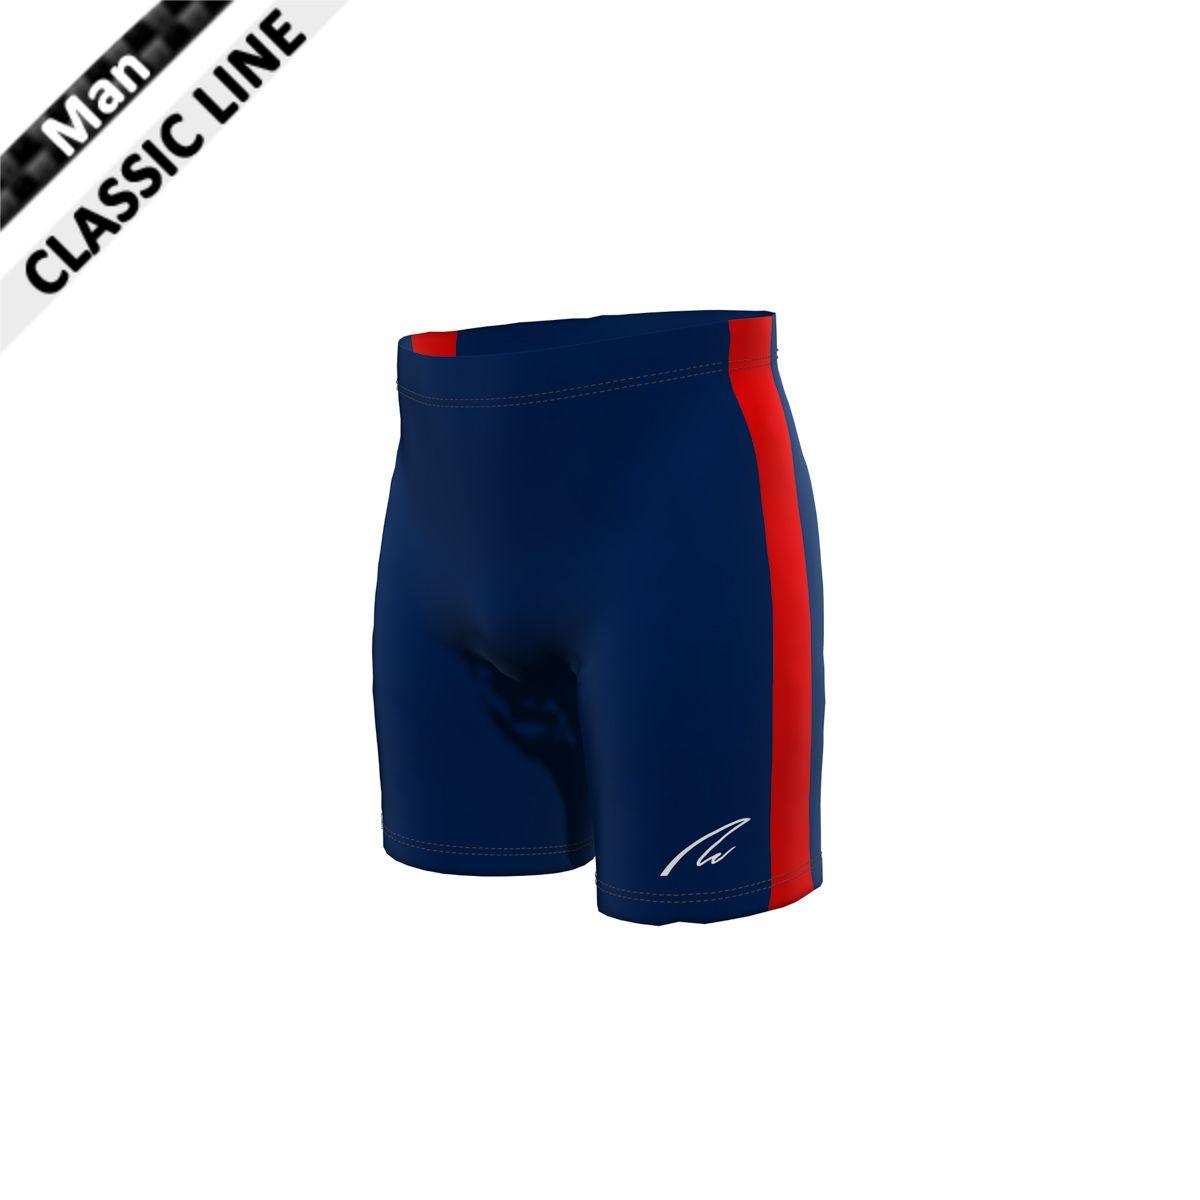 dbed9bcf77e3b Coloured Side Stripe - Short Tights - New Wave Sportswear GmbH